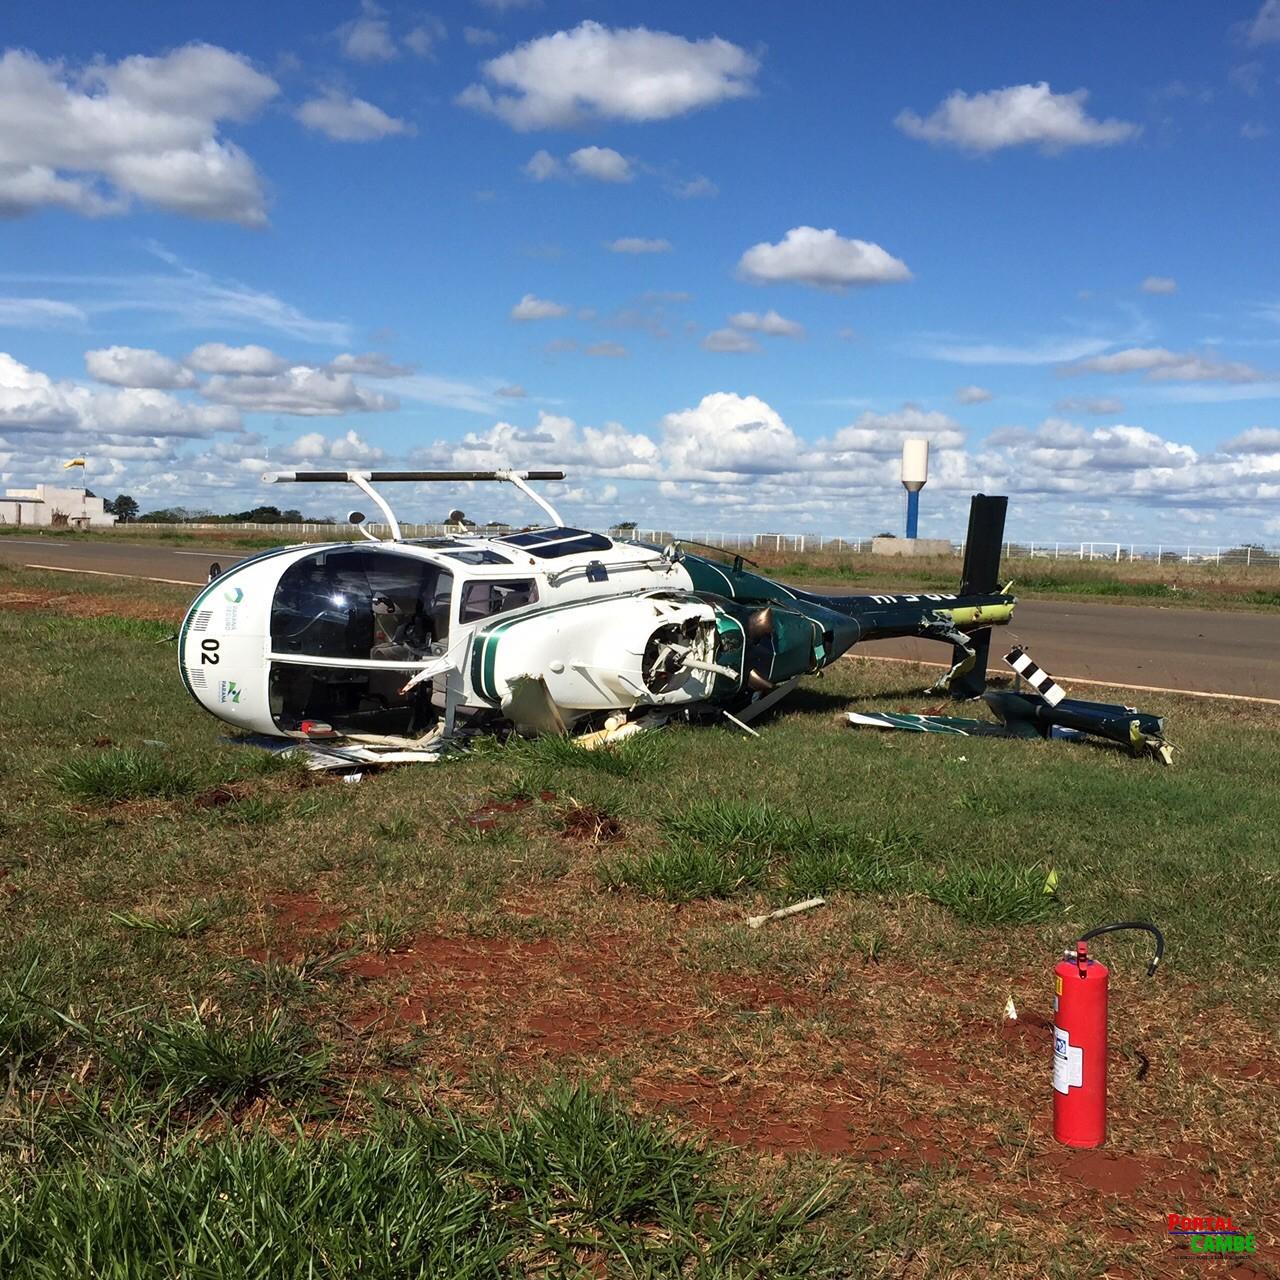 Helicóptero do GRAER de Londrina faz pouso forçado no Aeroporto 14 Biz